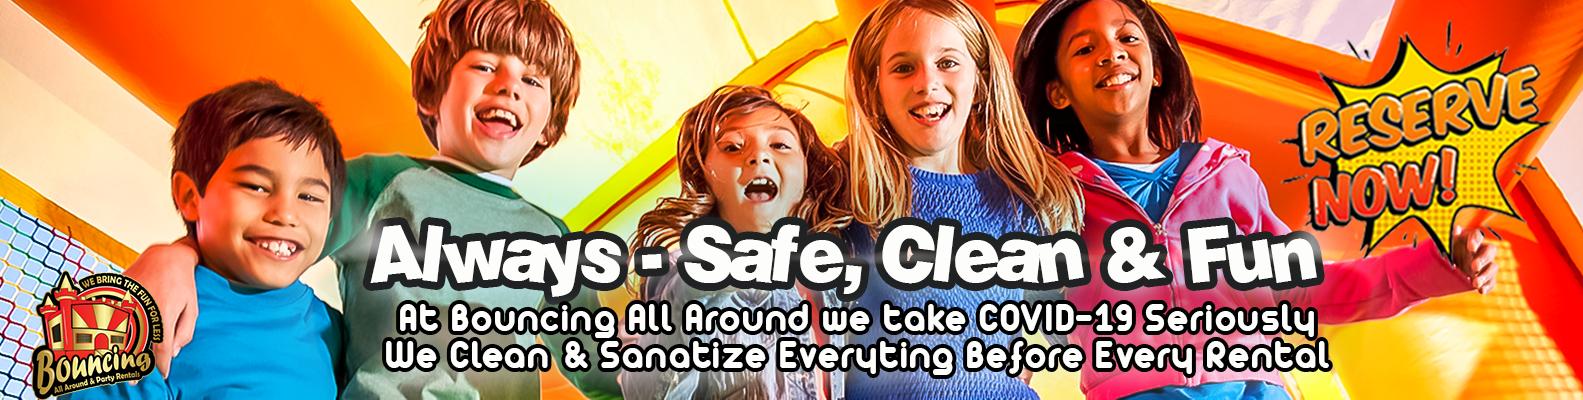 Clean, Safe & Fun